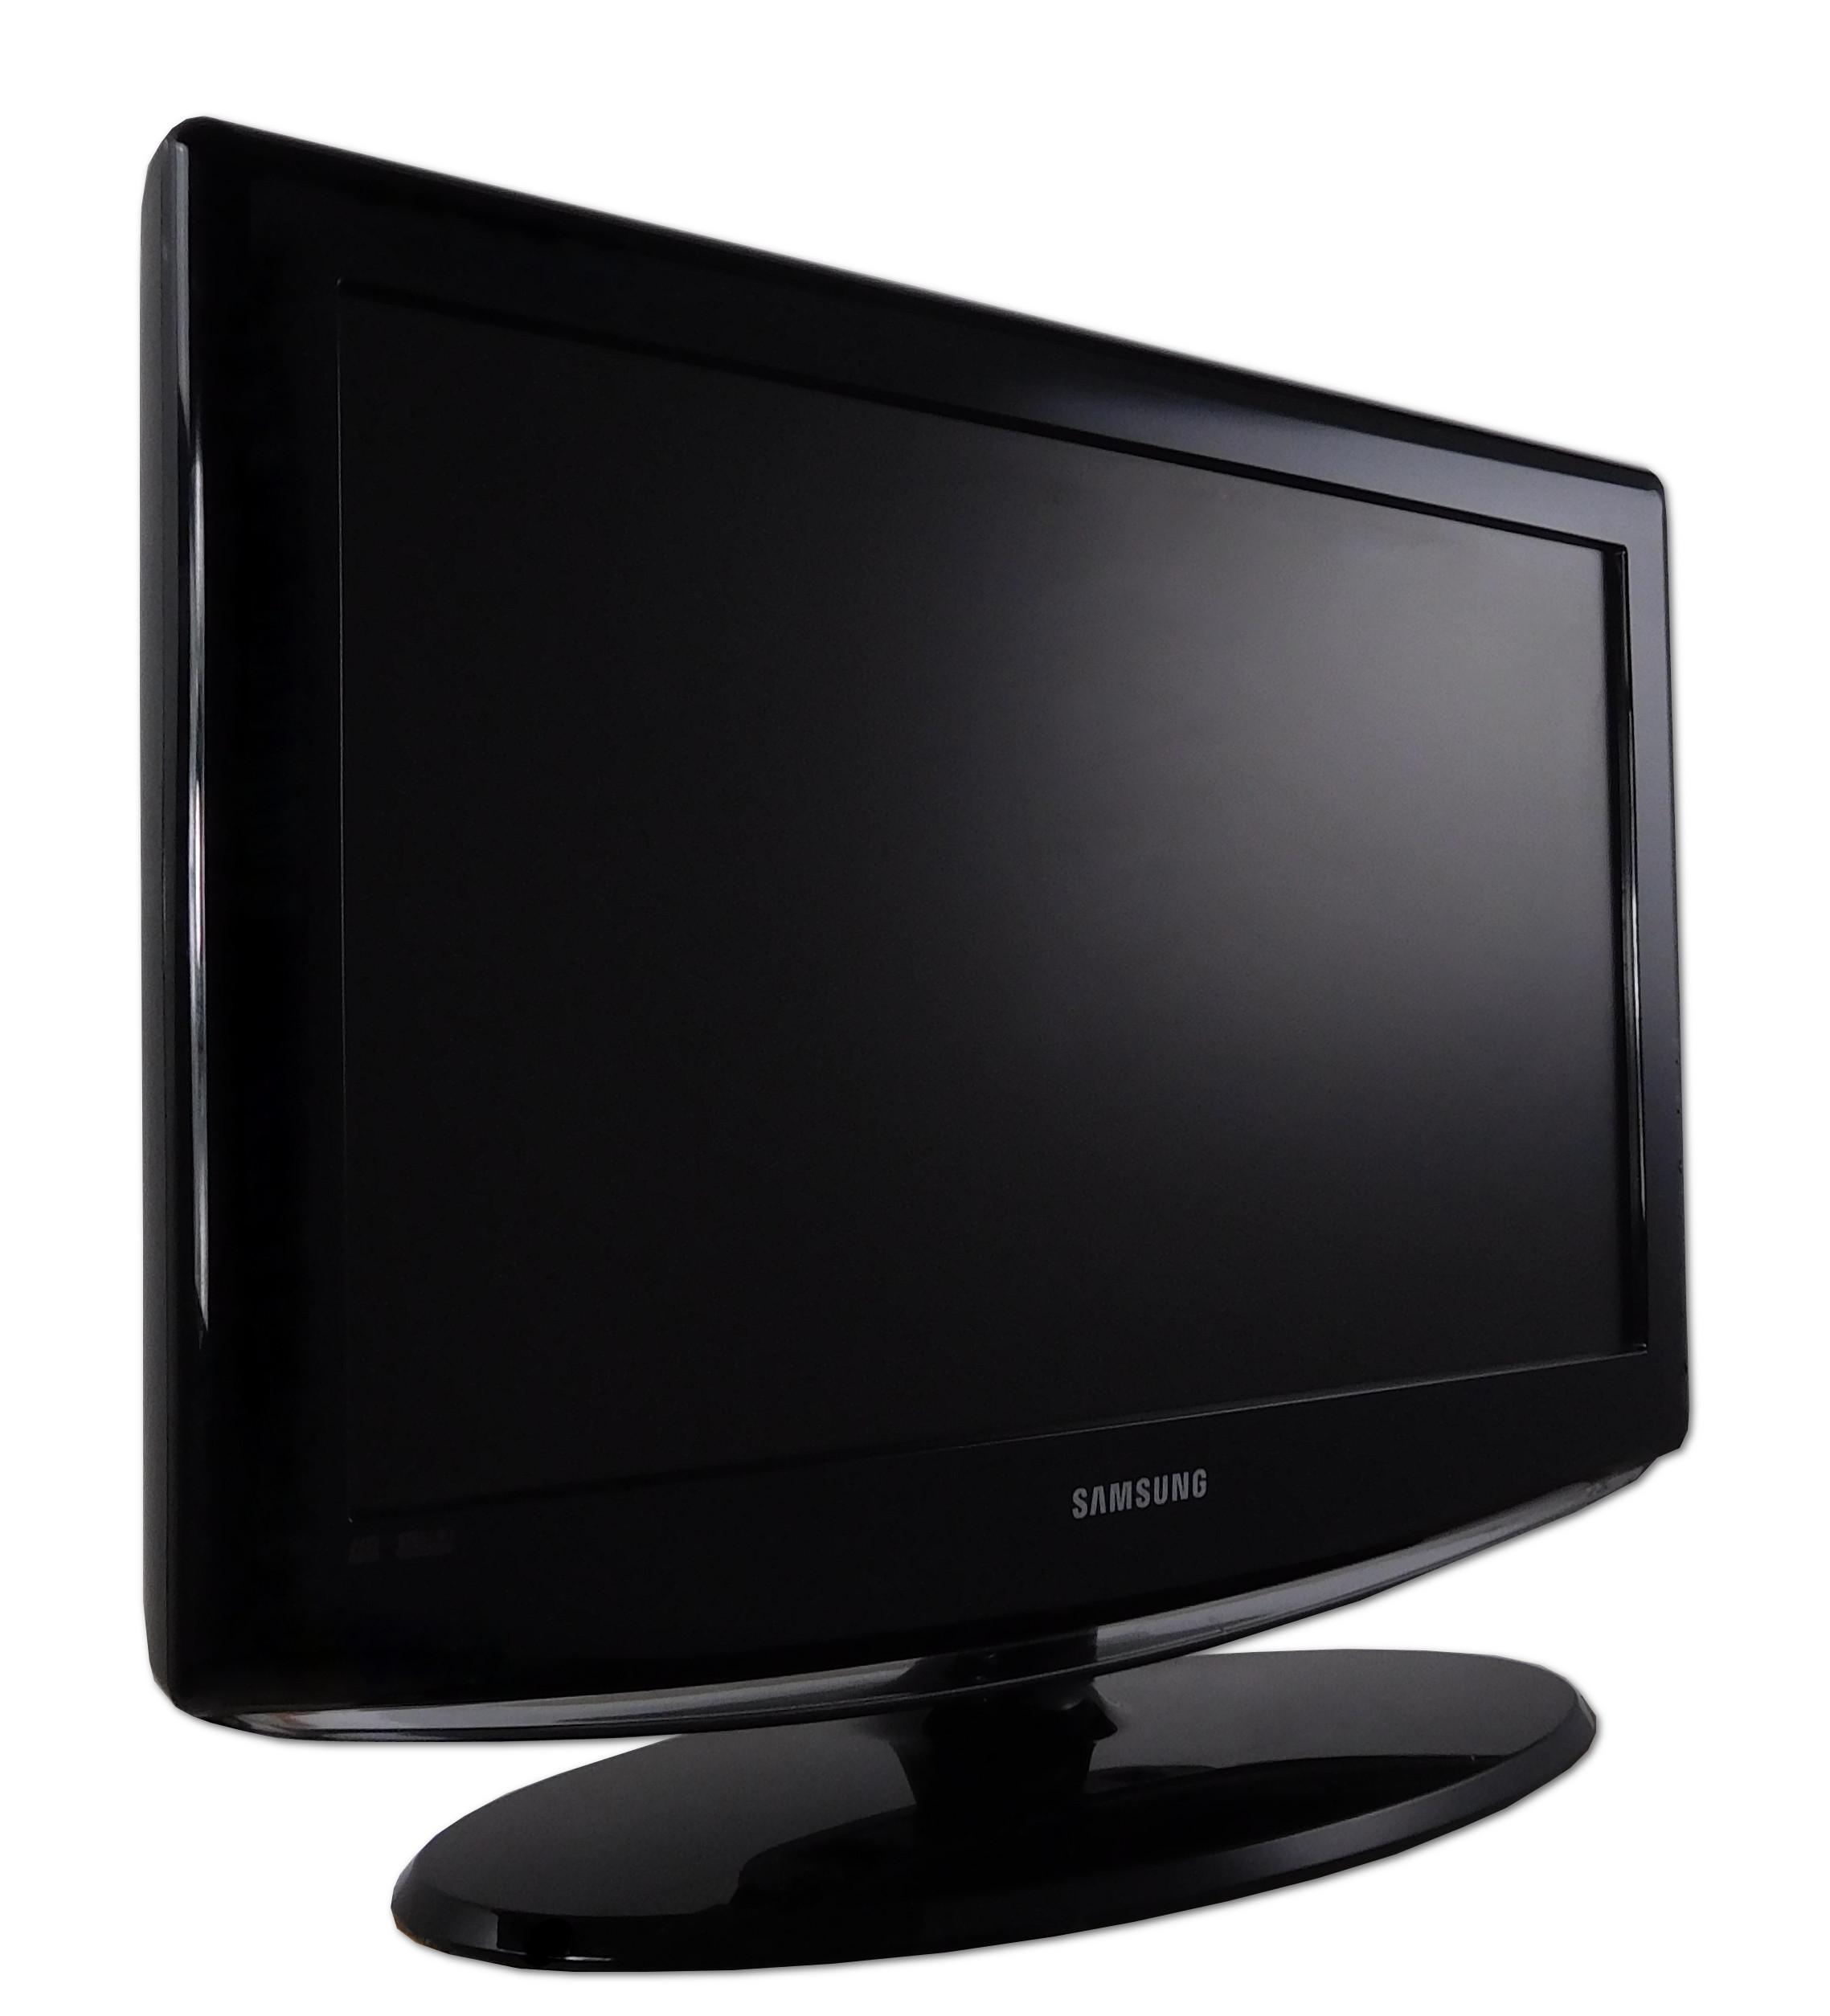 philips 66 cm 26 zoll fernseher lcd flat tv hd ready 2x scart 2x hdmi ebay. Black Bedroom Furniture Sets. Home Design Ideas